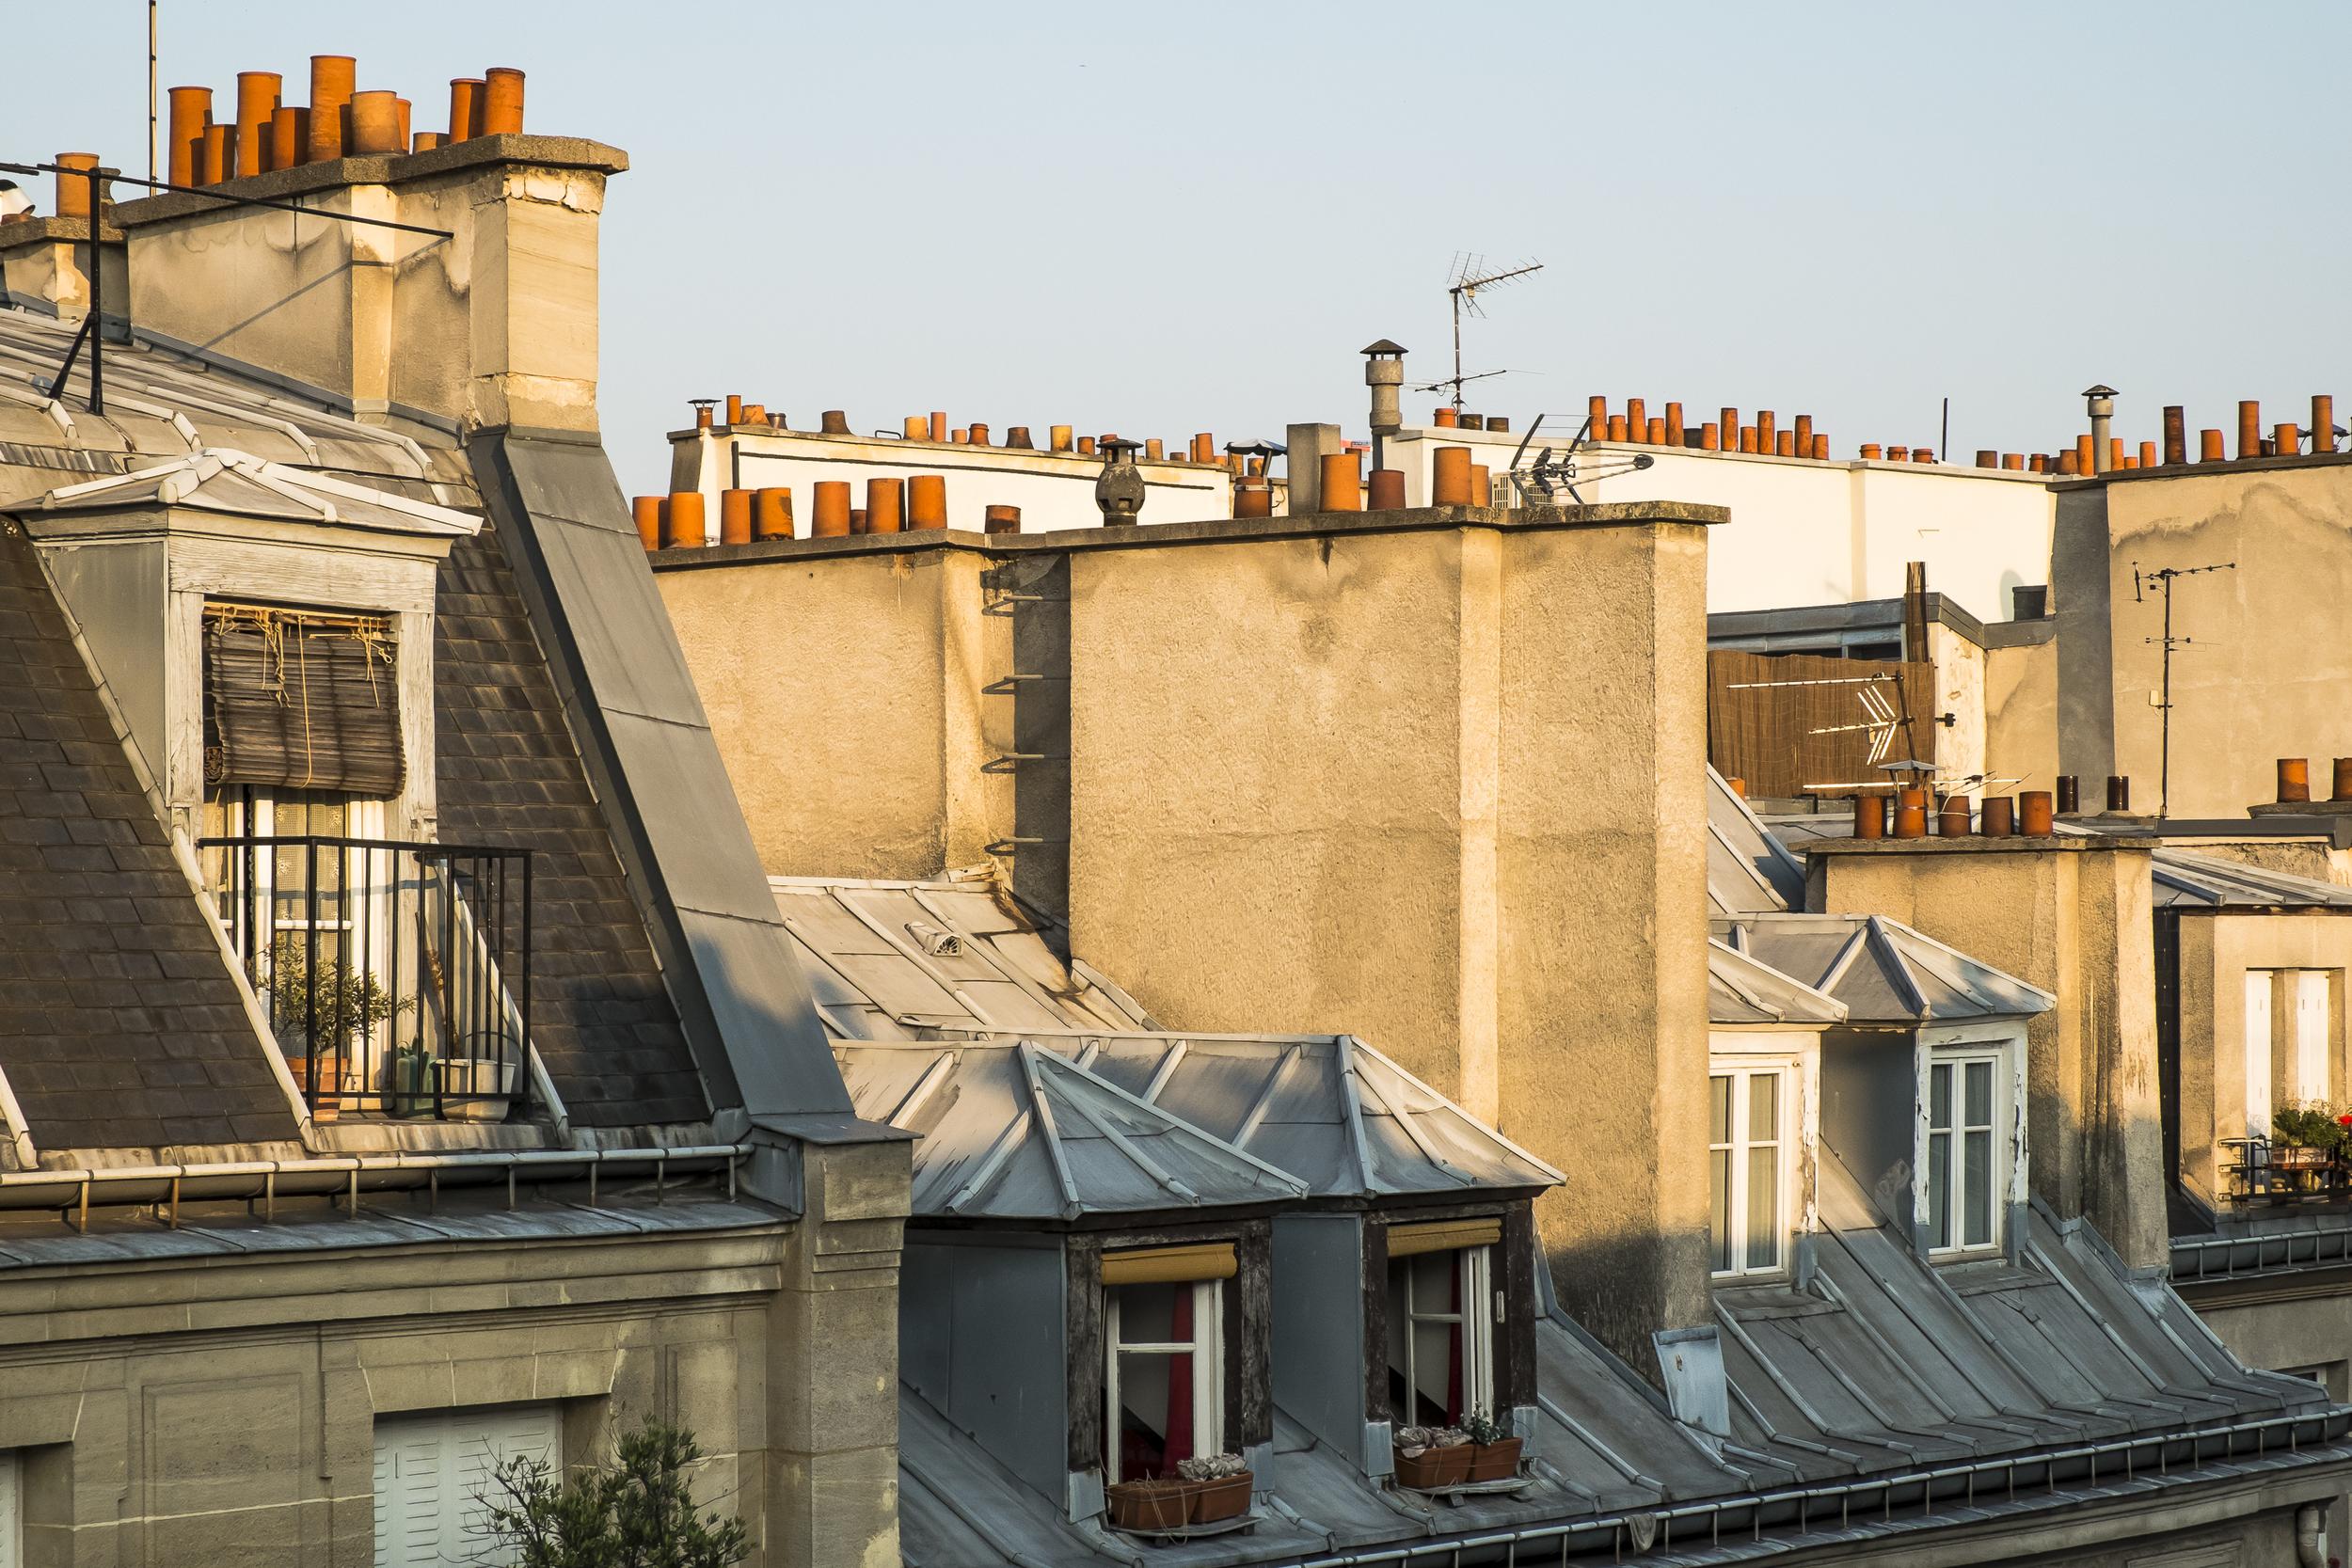 Paris-RuedeSeineRooftops-20130707-DSCF3706.jpg